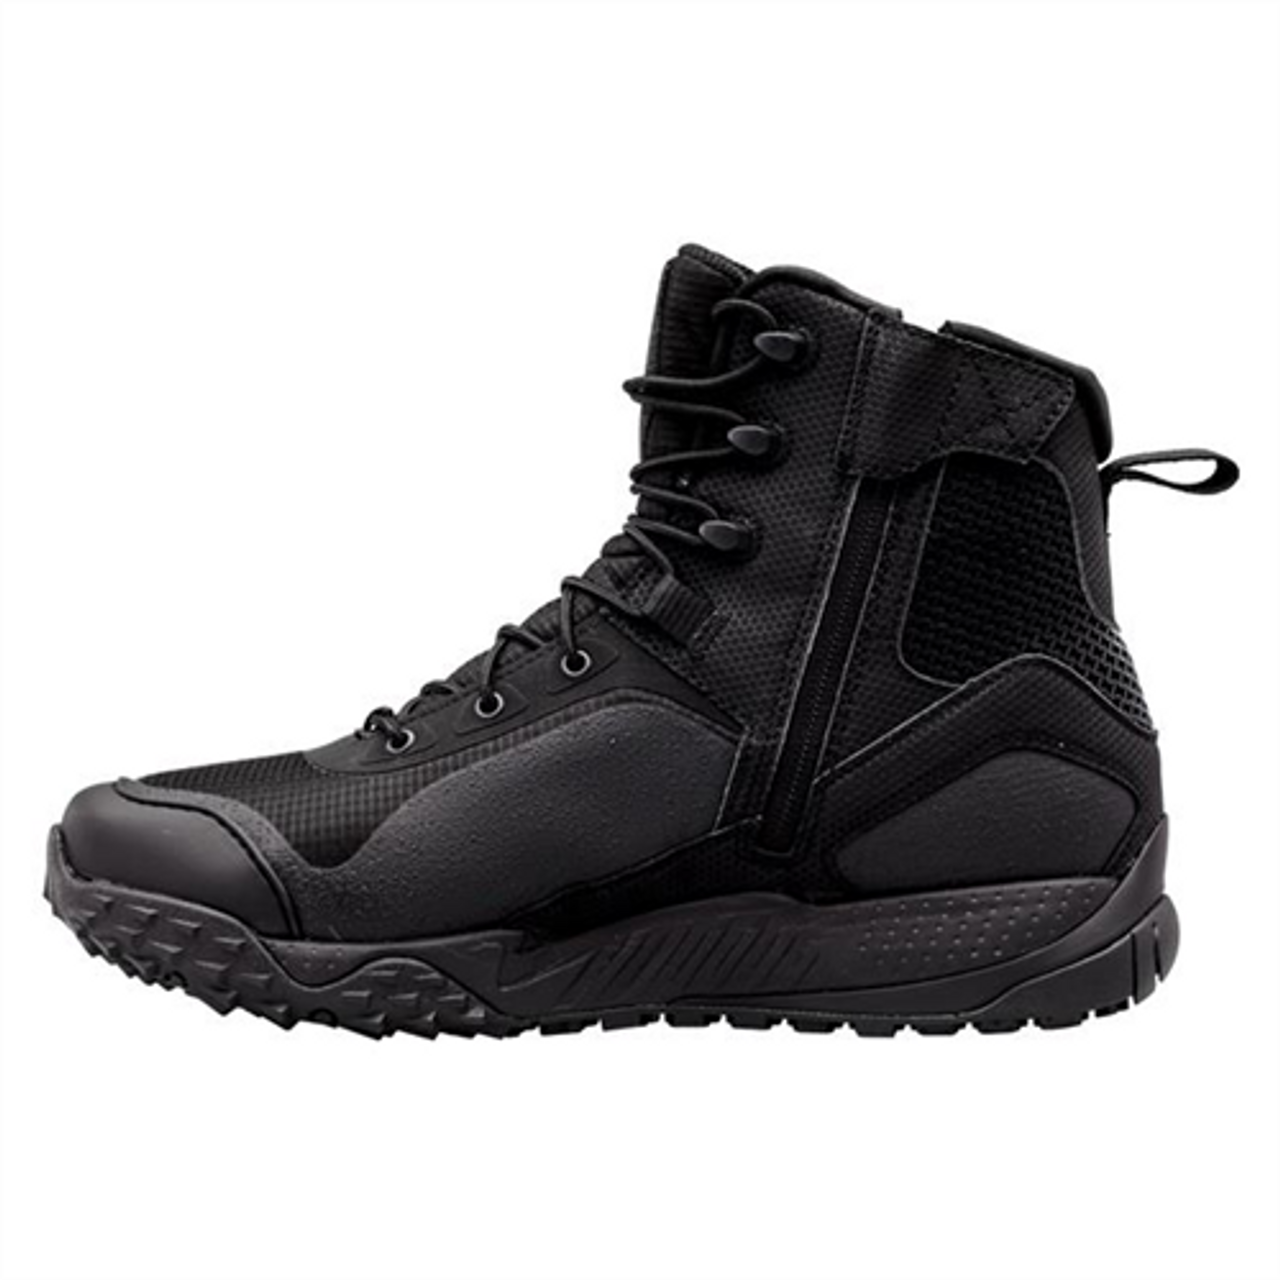 e378beeeb35 UA Valsetz RTS Side-Zip Tactical Boot